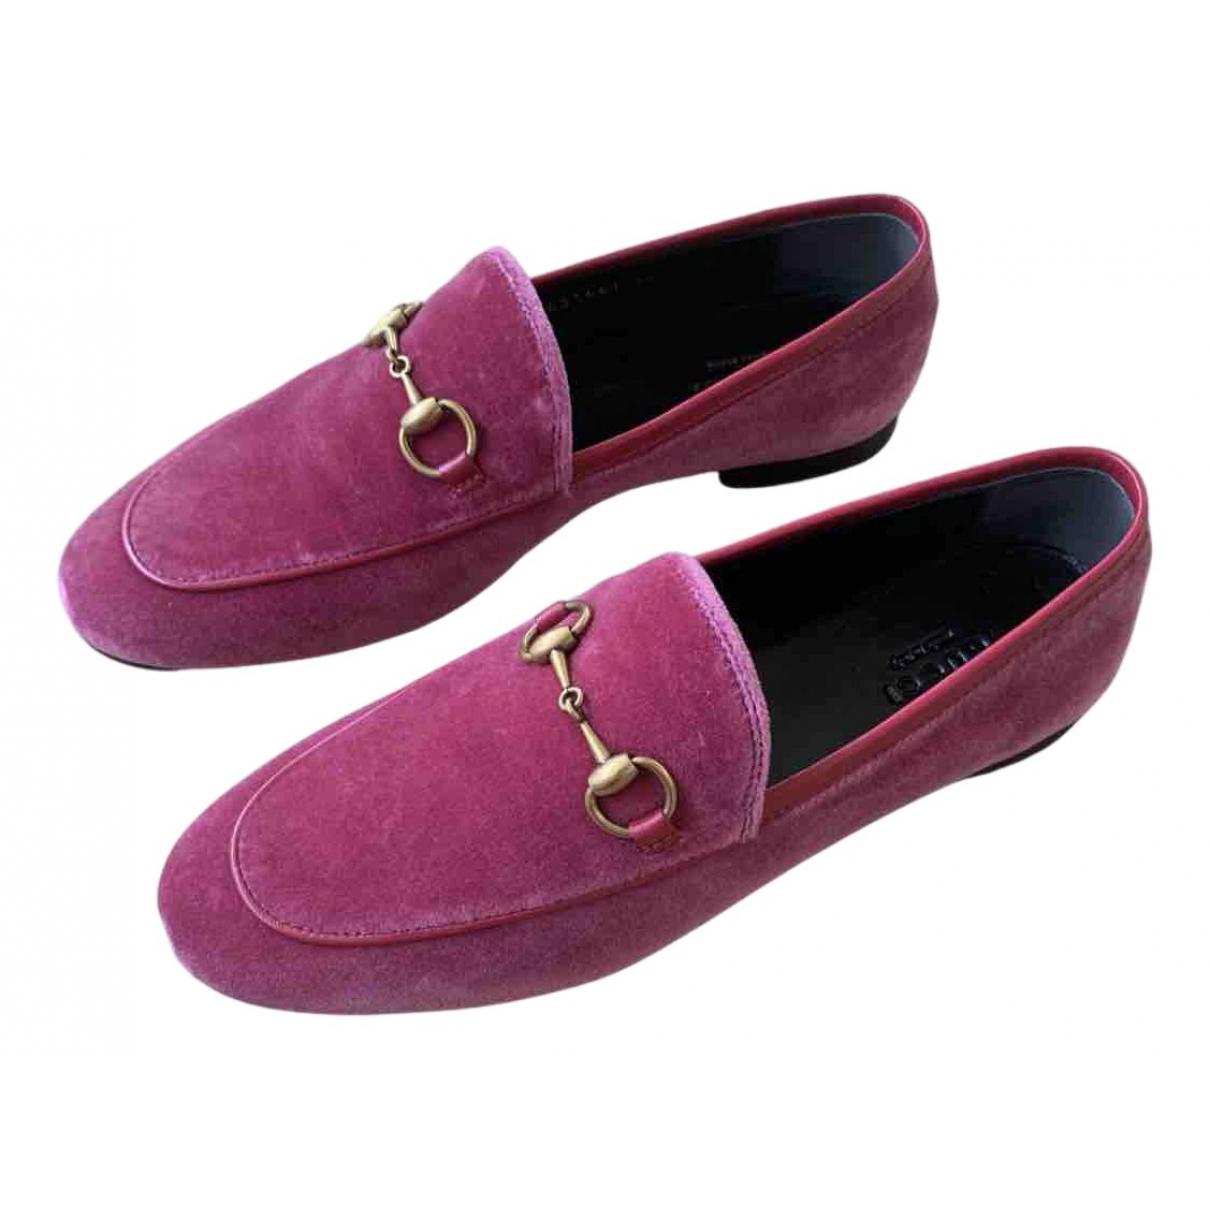 Gucci Jordaan Pink Suede Flats for Women 36 EU